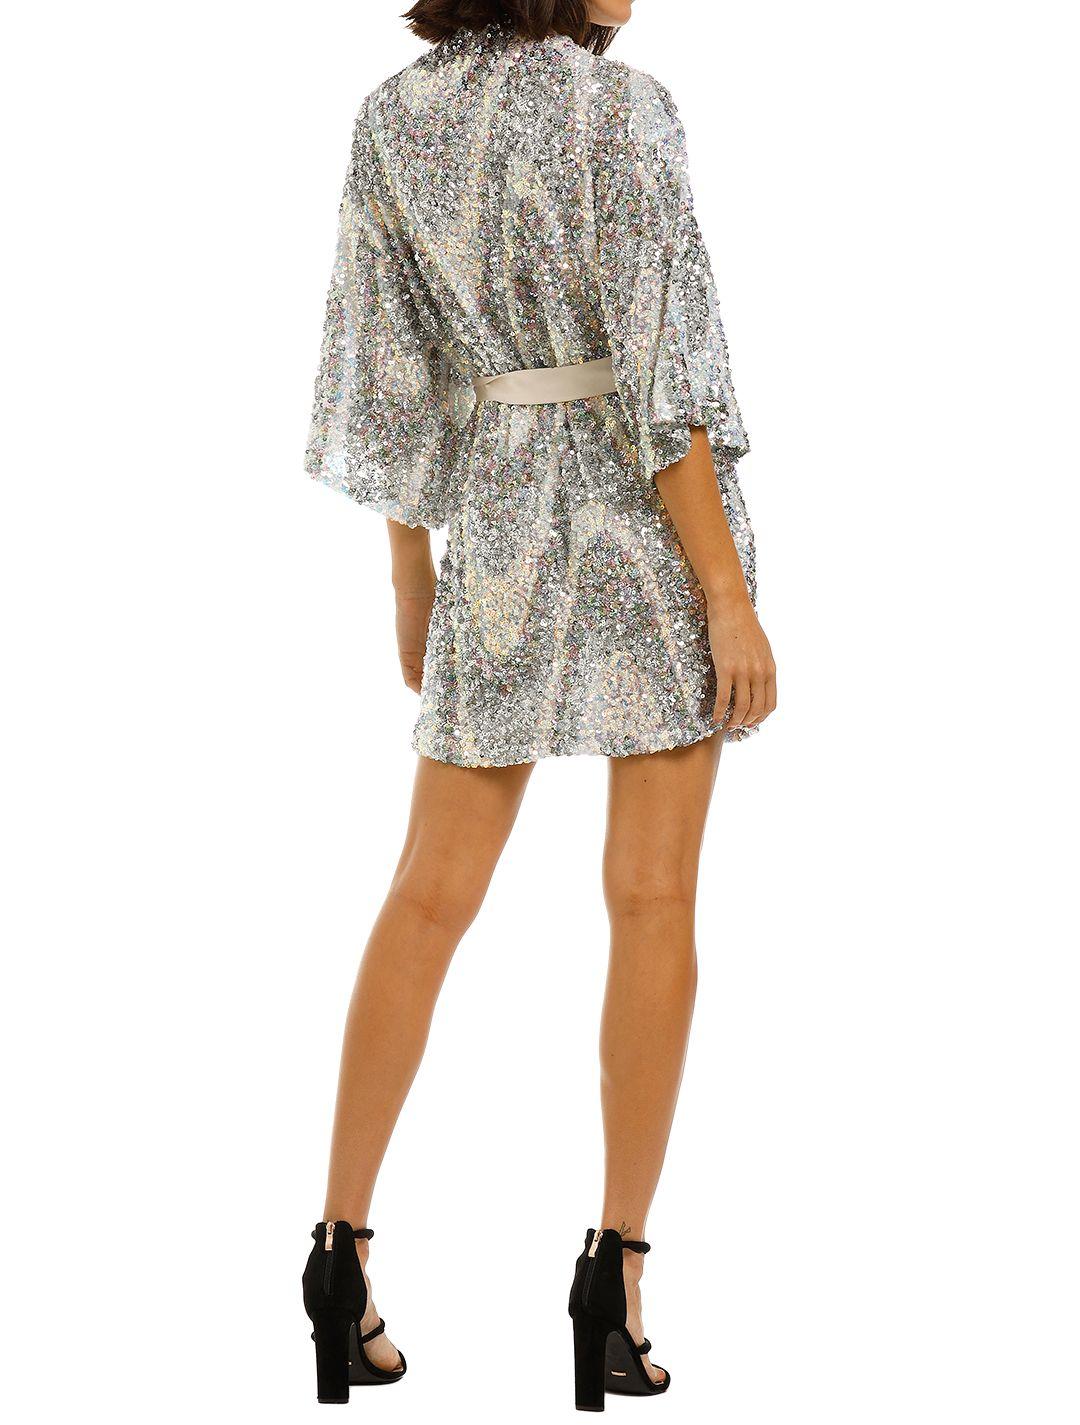 Winona-Rhapsody-Wrap-Dress-Multi-BAck